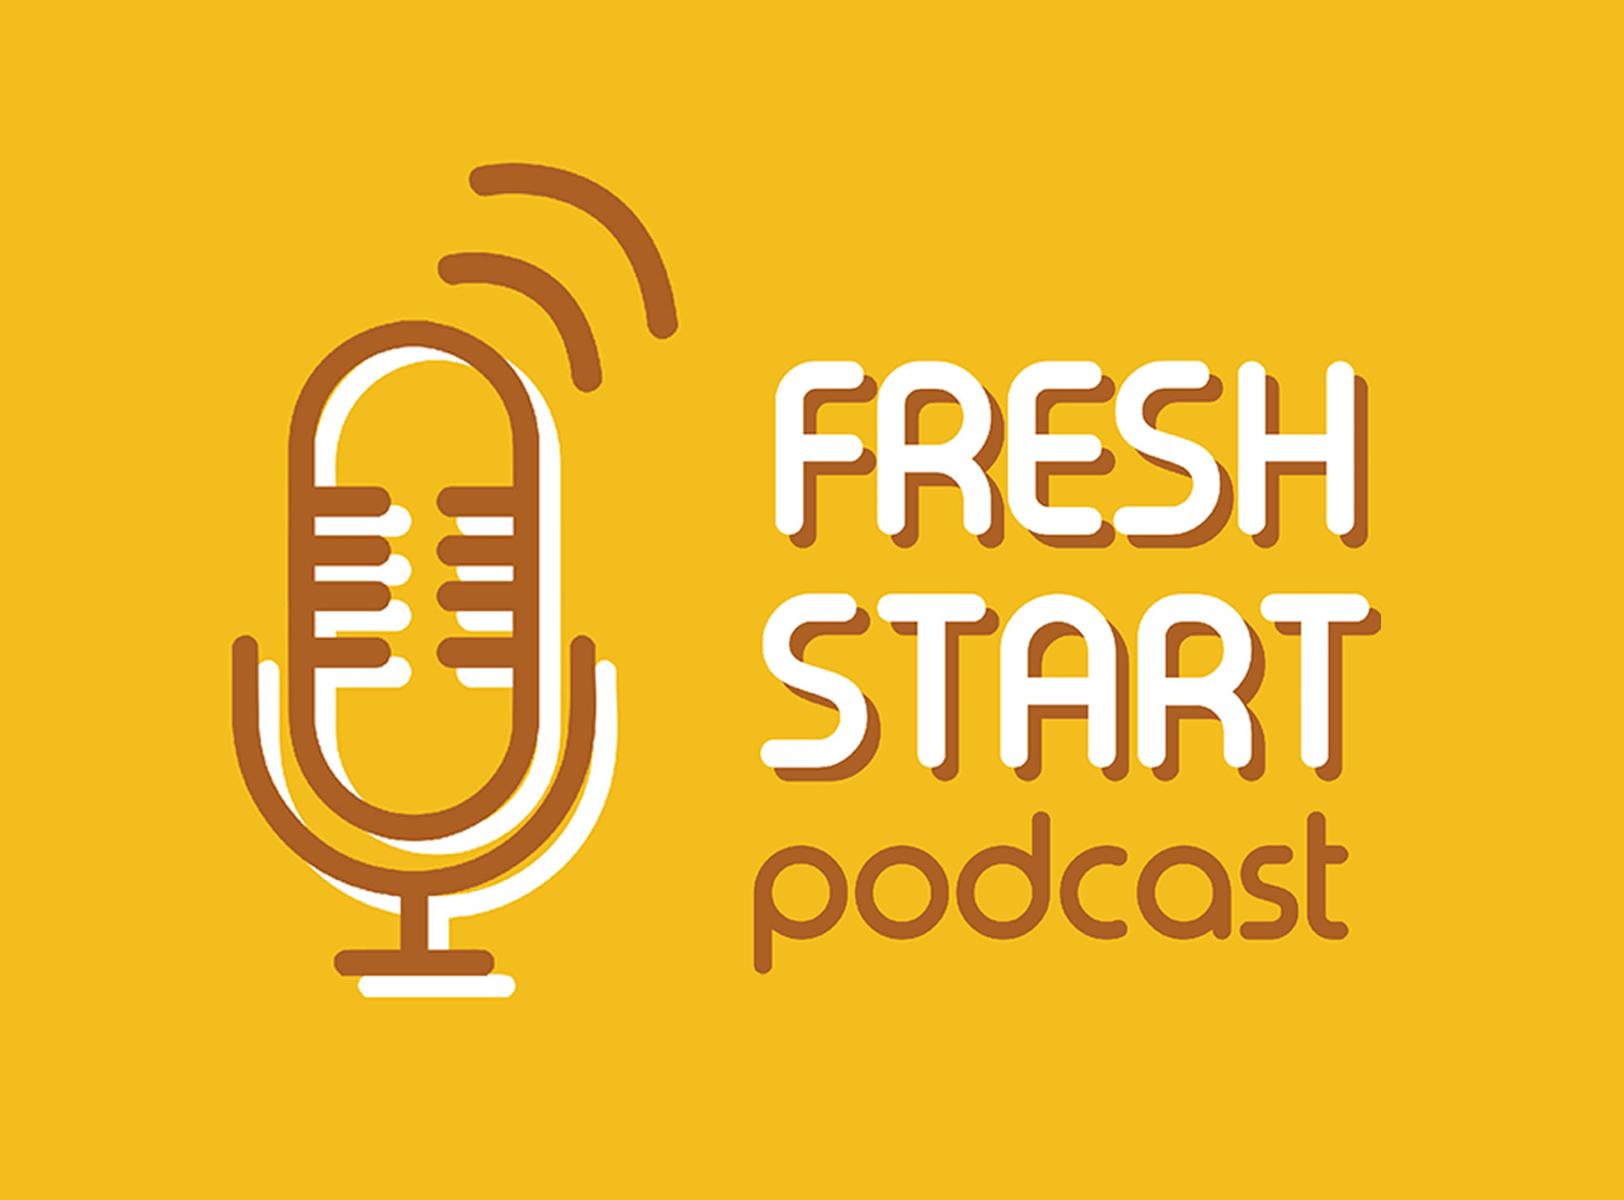 Fresh Start: Podcast News (11/6/2019 Wed.)